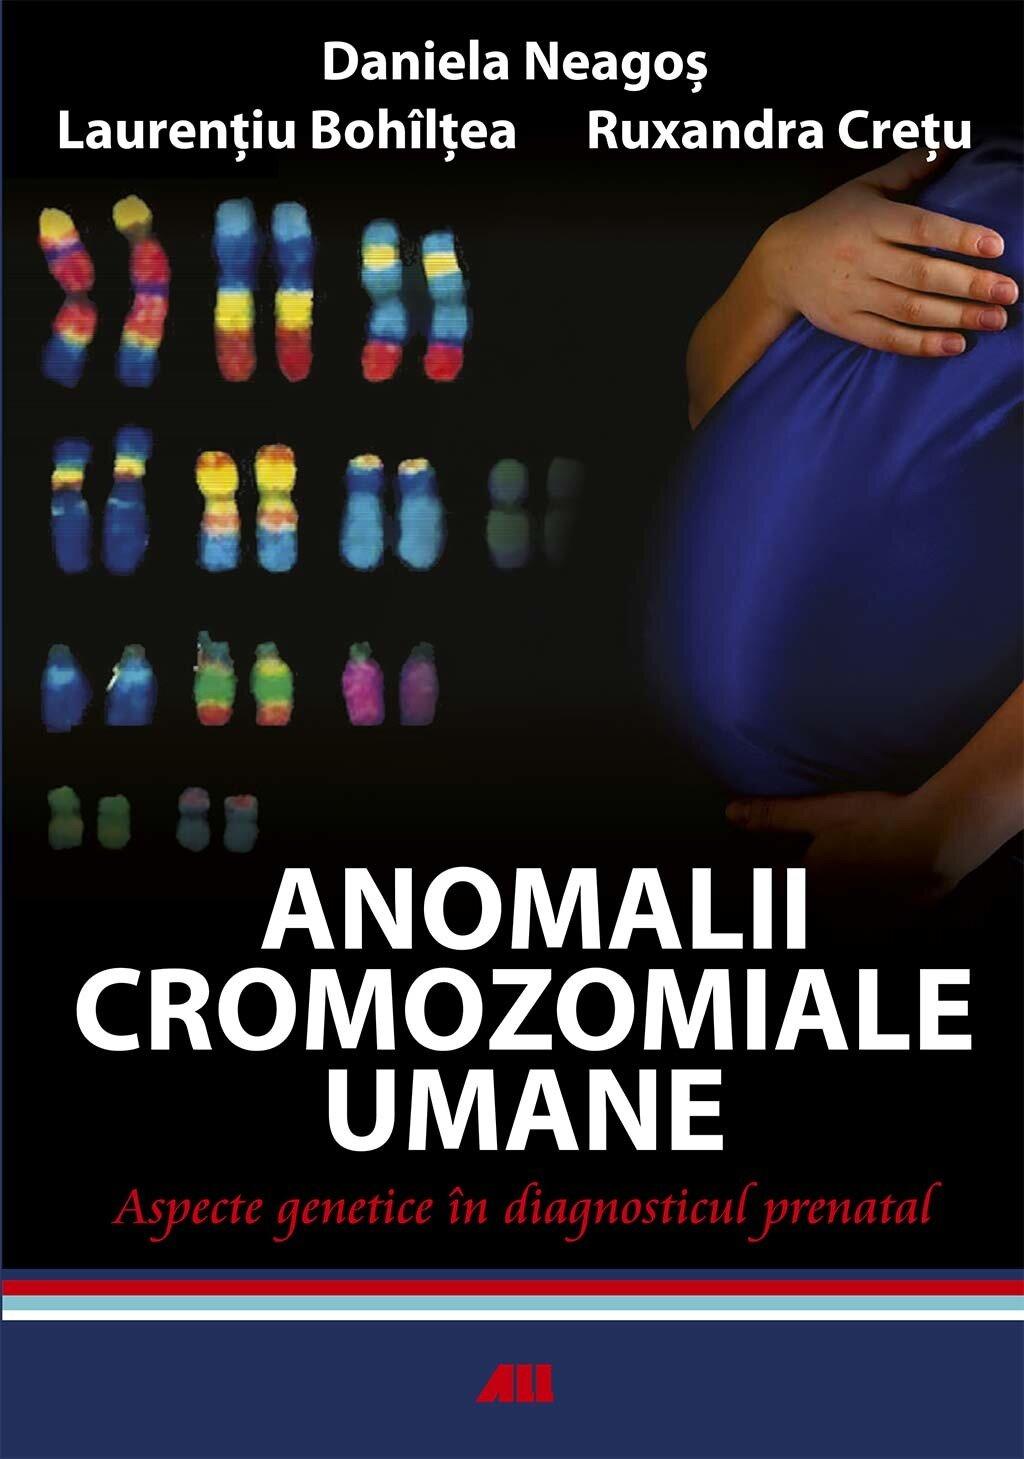 Anomalii cromozomiale umane. Aspecte genetice in diagnosticul prenatal (eBook)